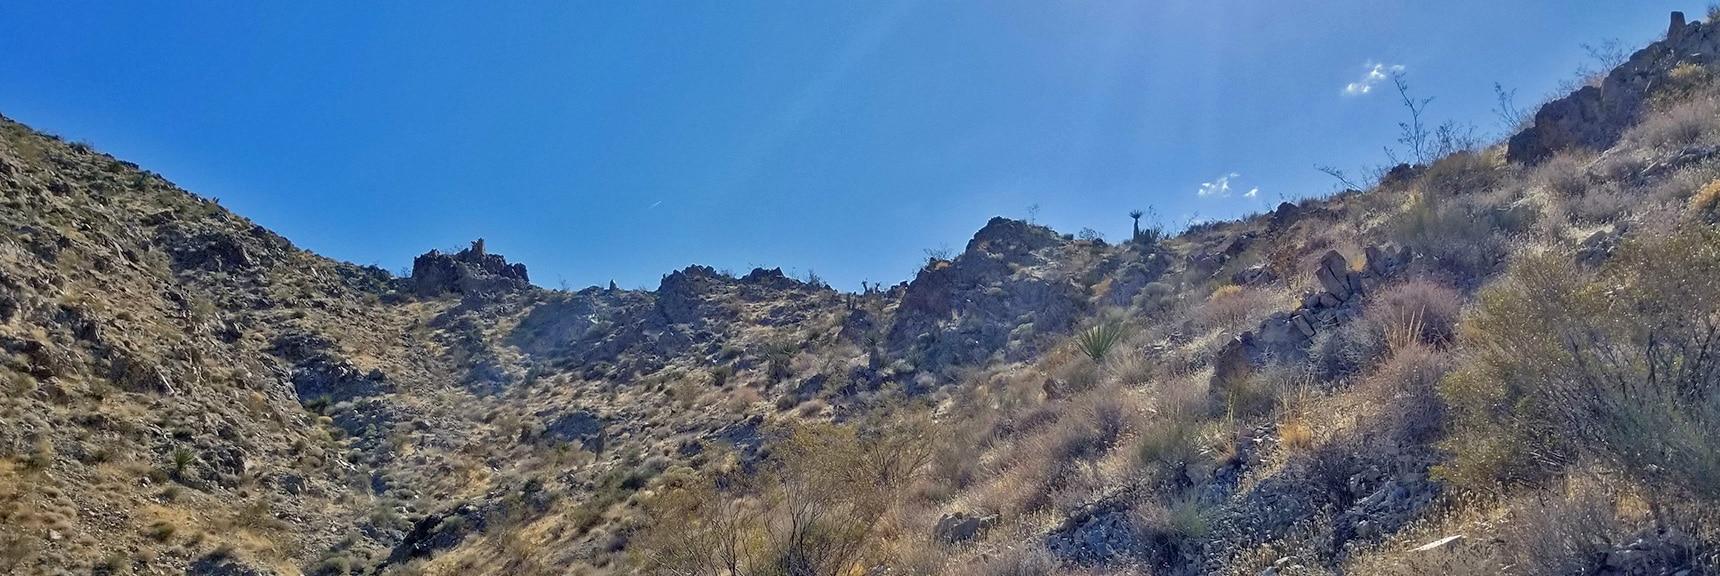 Next Ridge Above the Bowling Alley | Mt Wilson, Black Mountains, Arizona, Lake Mead National Recreation Area